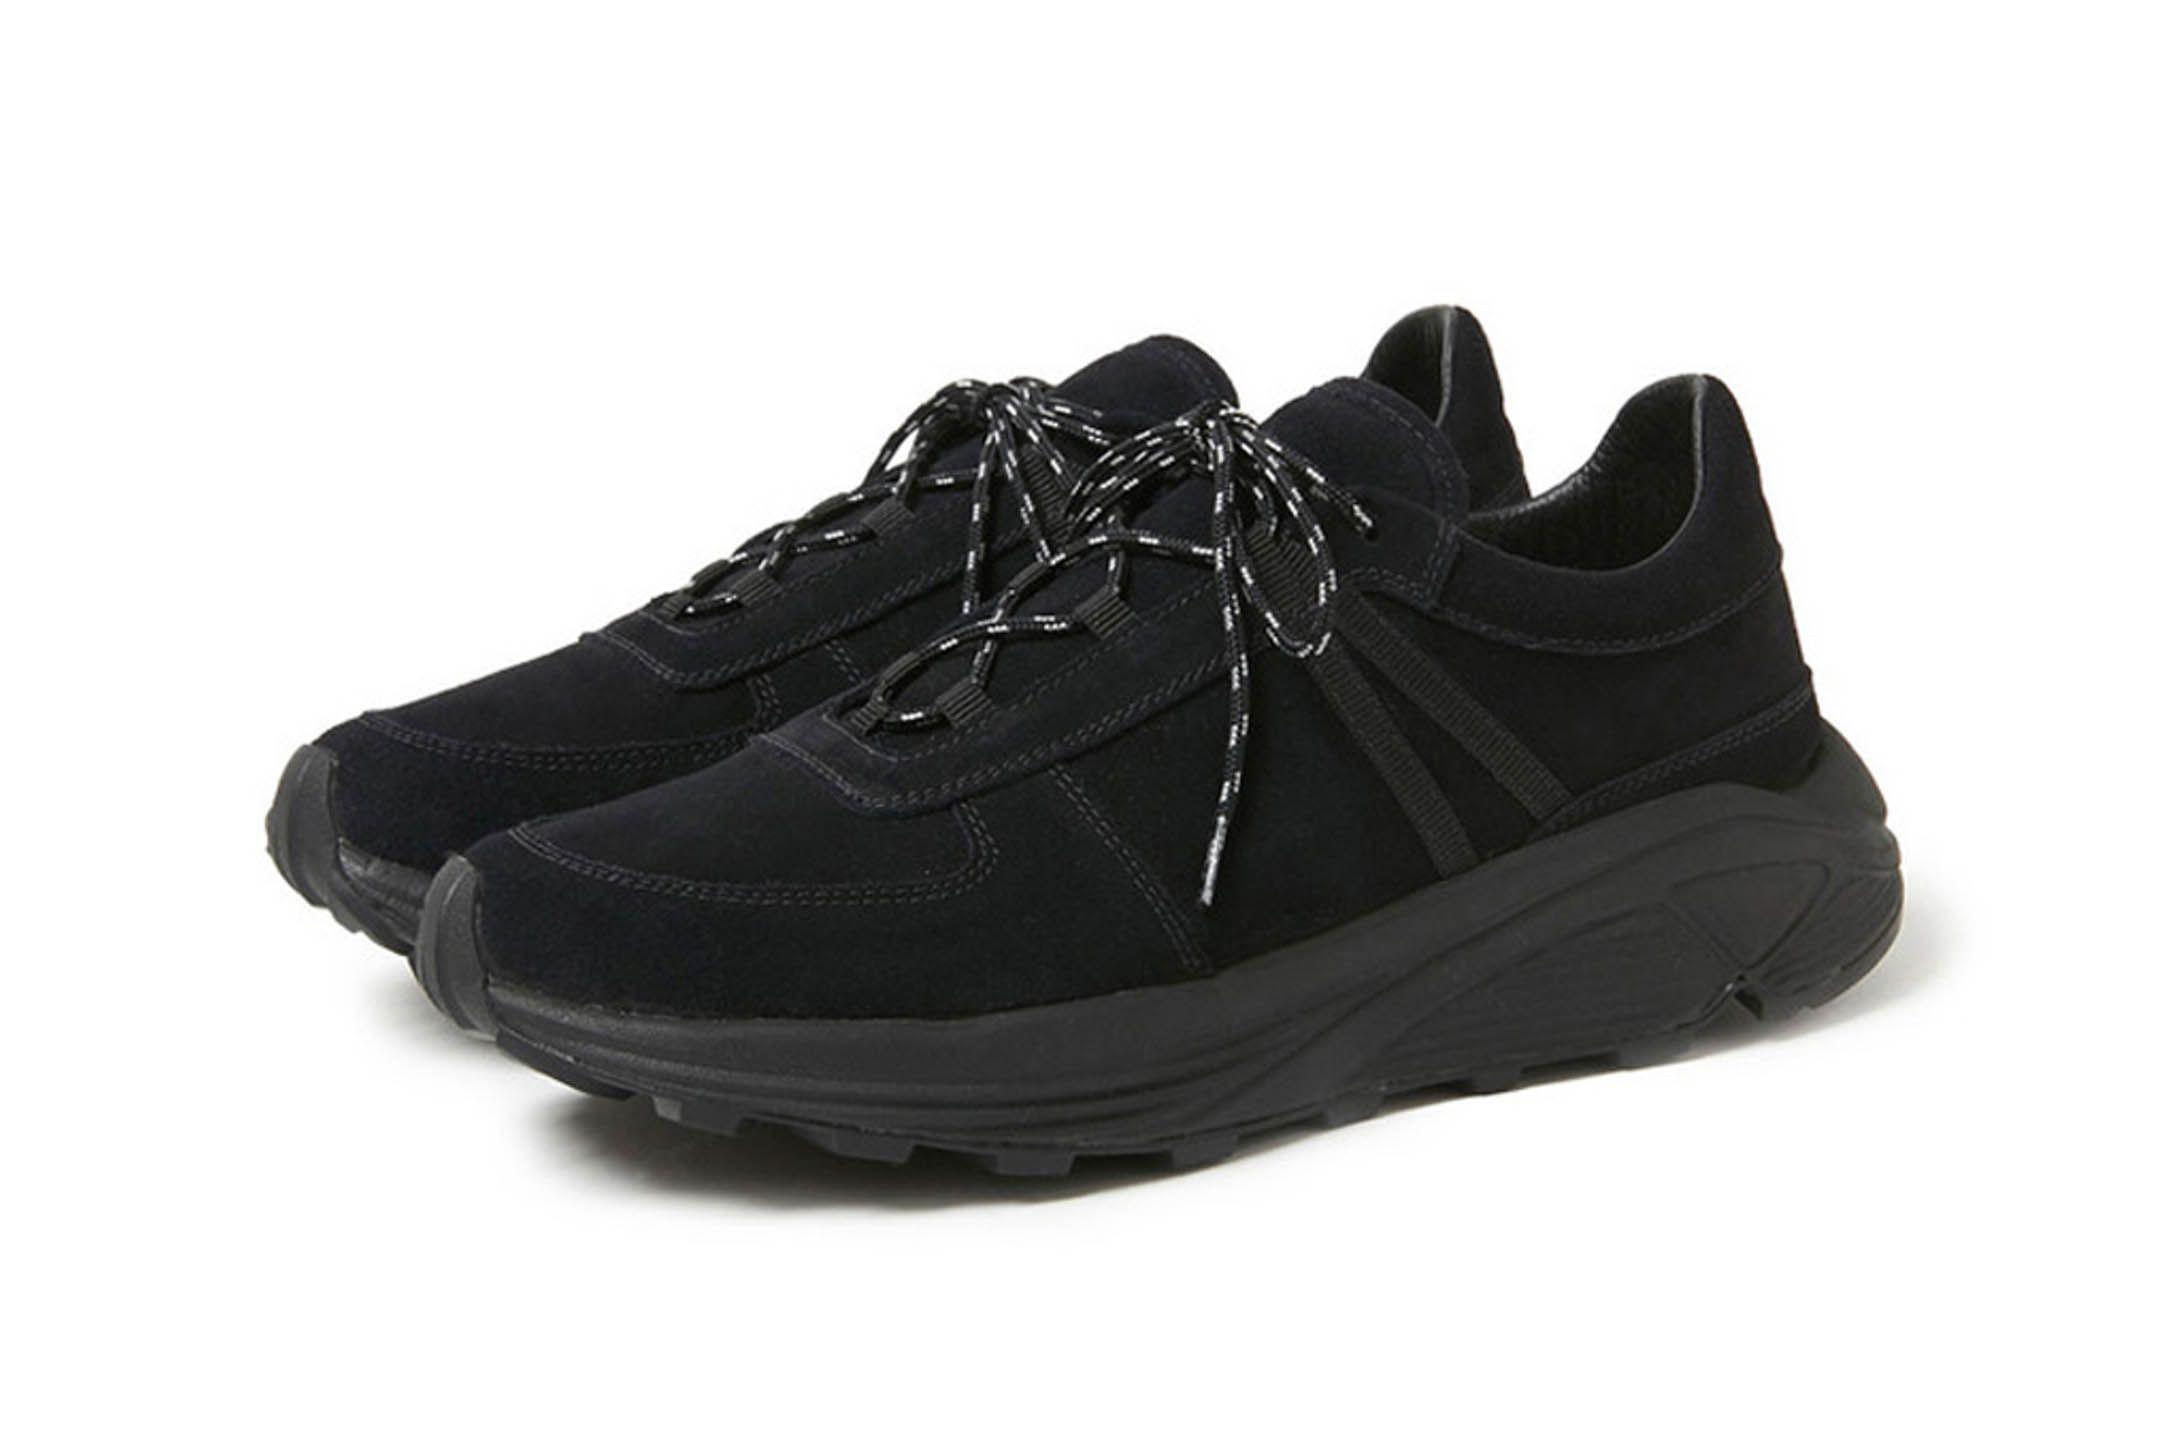 Nonnative Spring Summer 2018 Footwear Collection 5 Sneaker Freaker